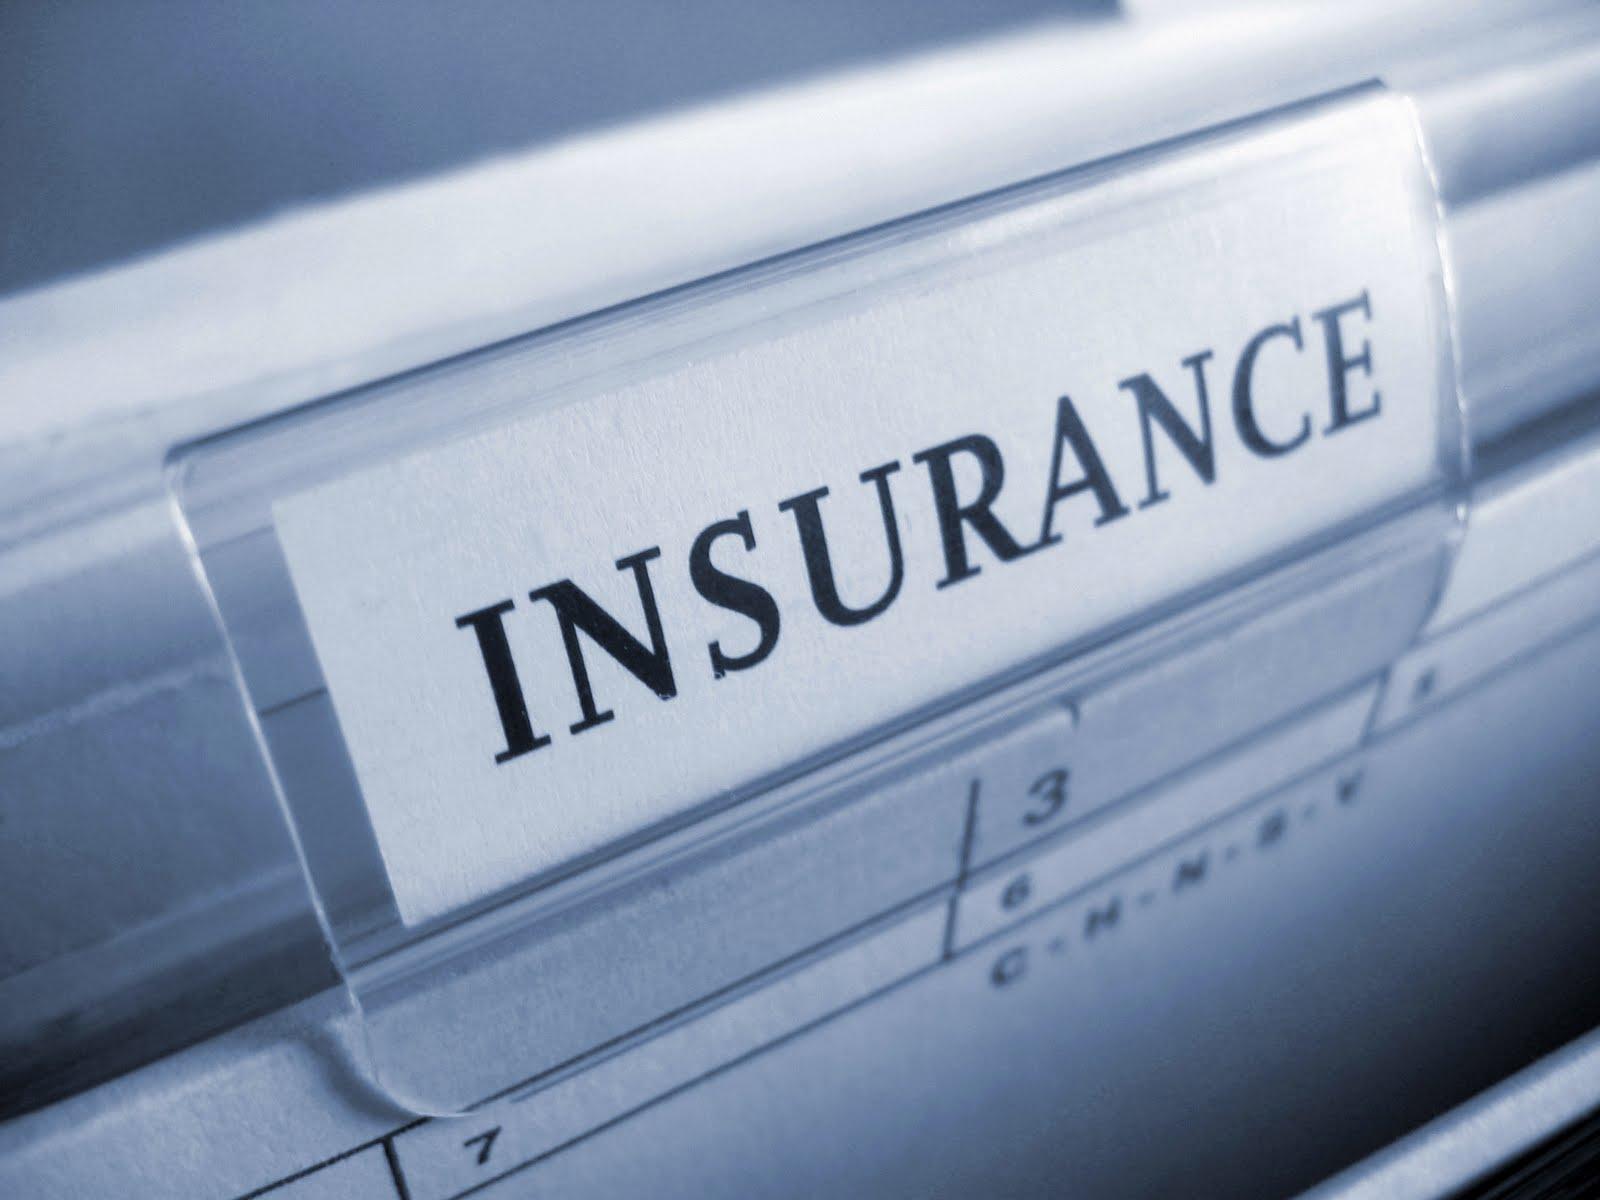 AIA Insurance Lanka PLC